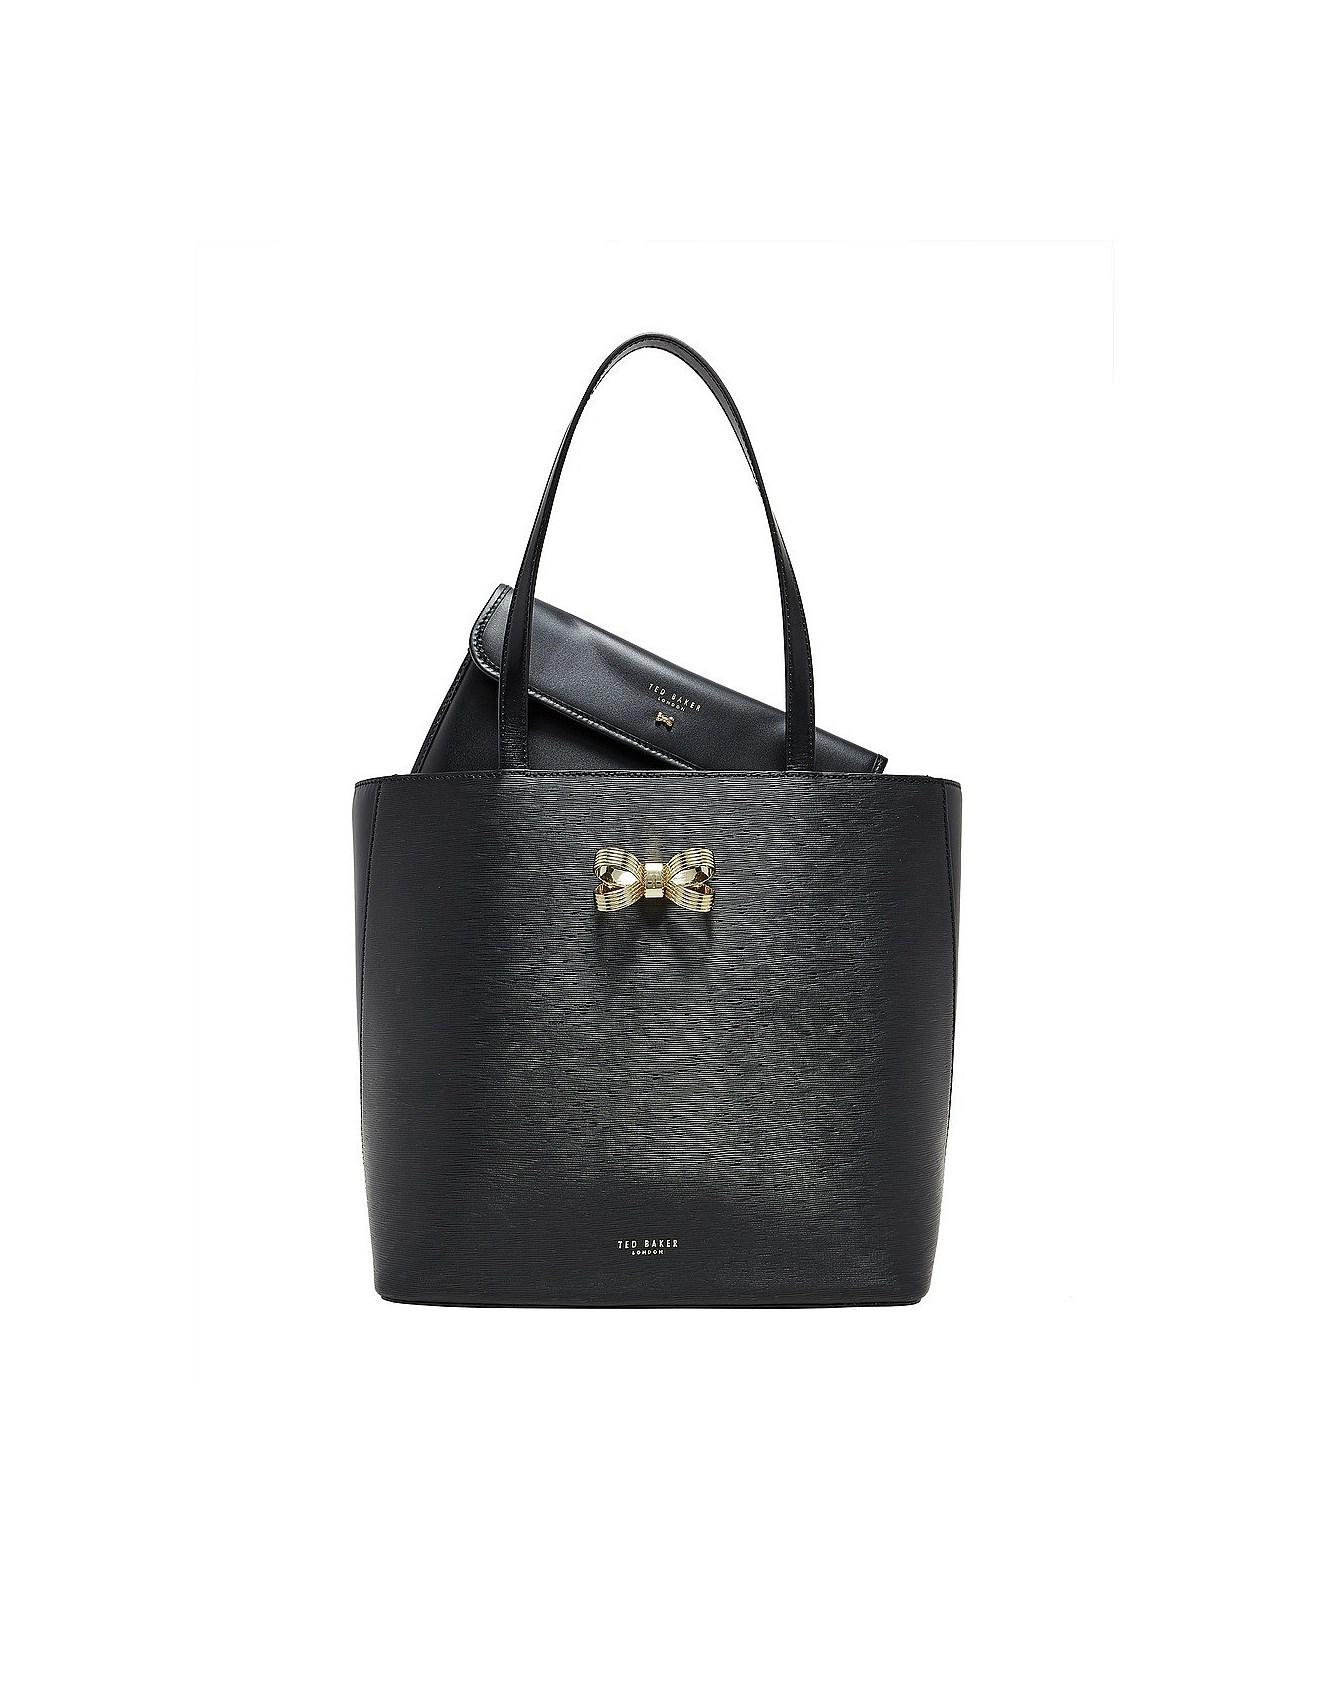 women 39 s bags handbags clutches tote bags online david jones looped bow shopper. Black Bedroom Furniture Sets. Home Design Ideas